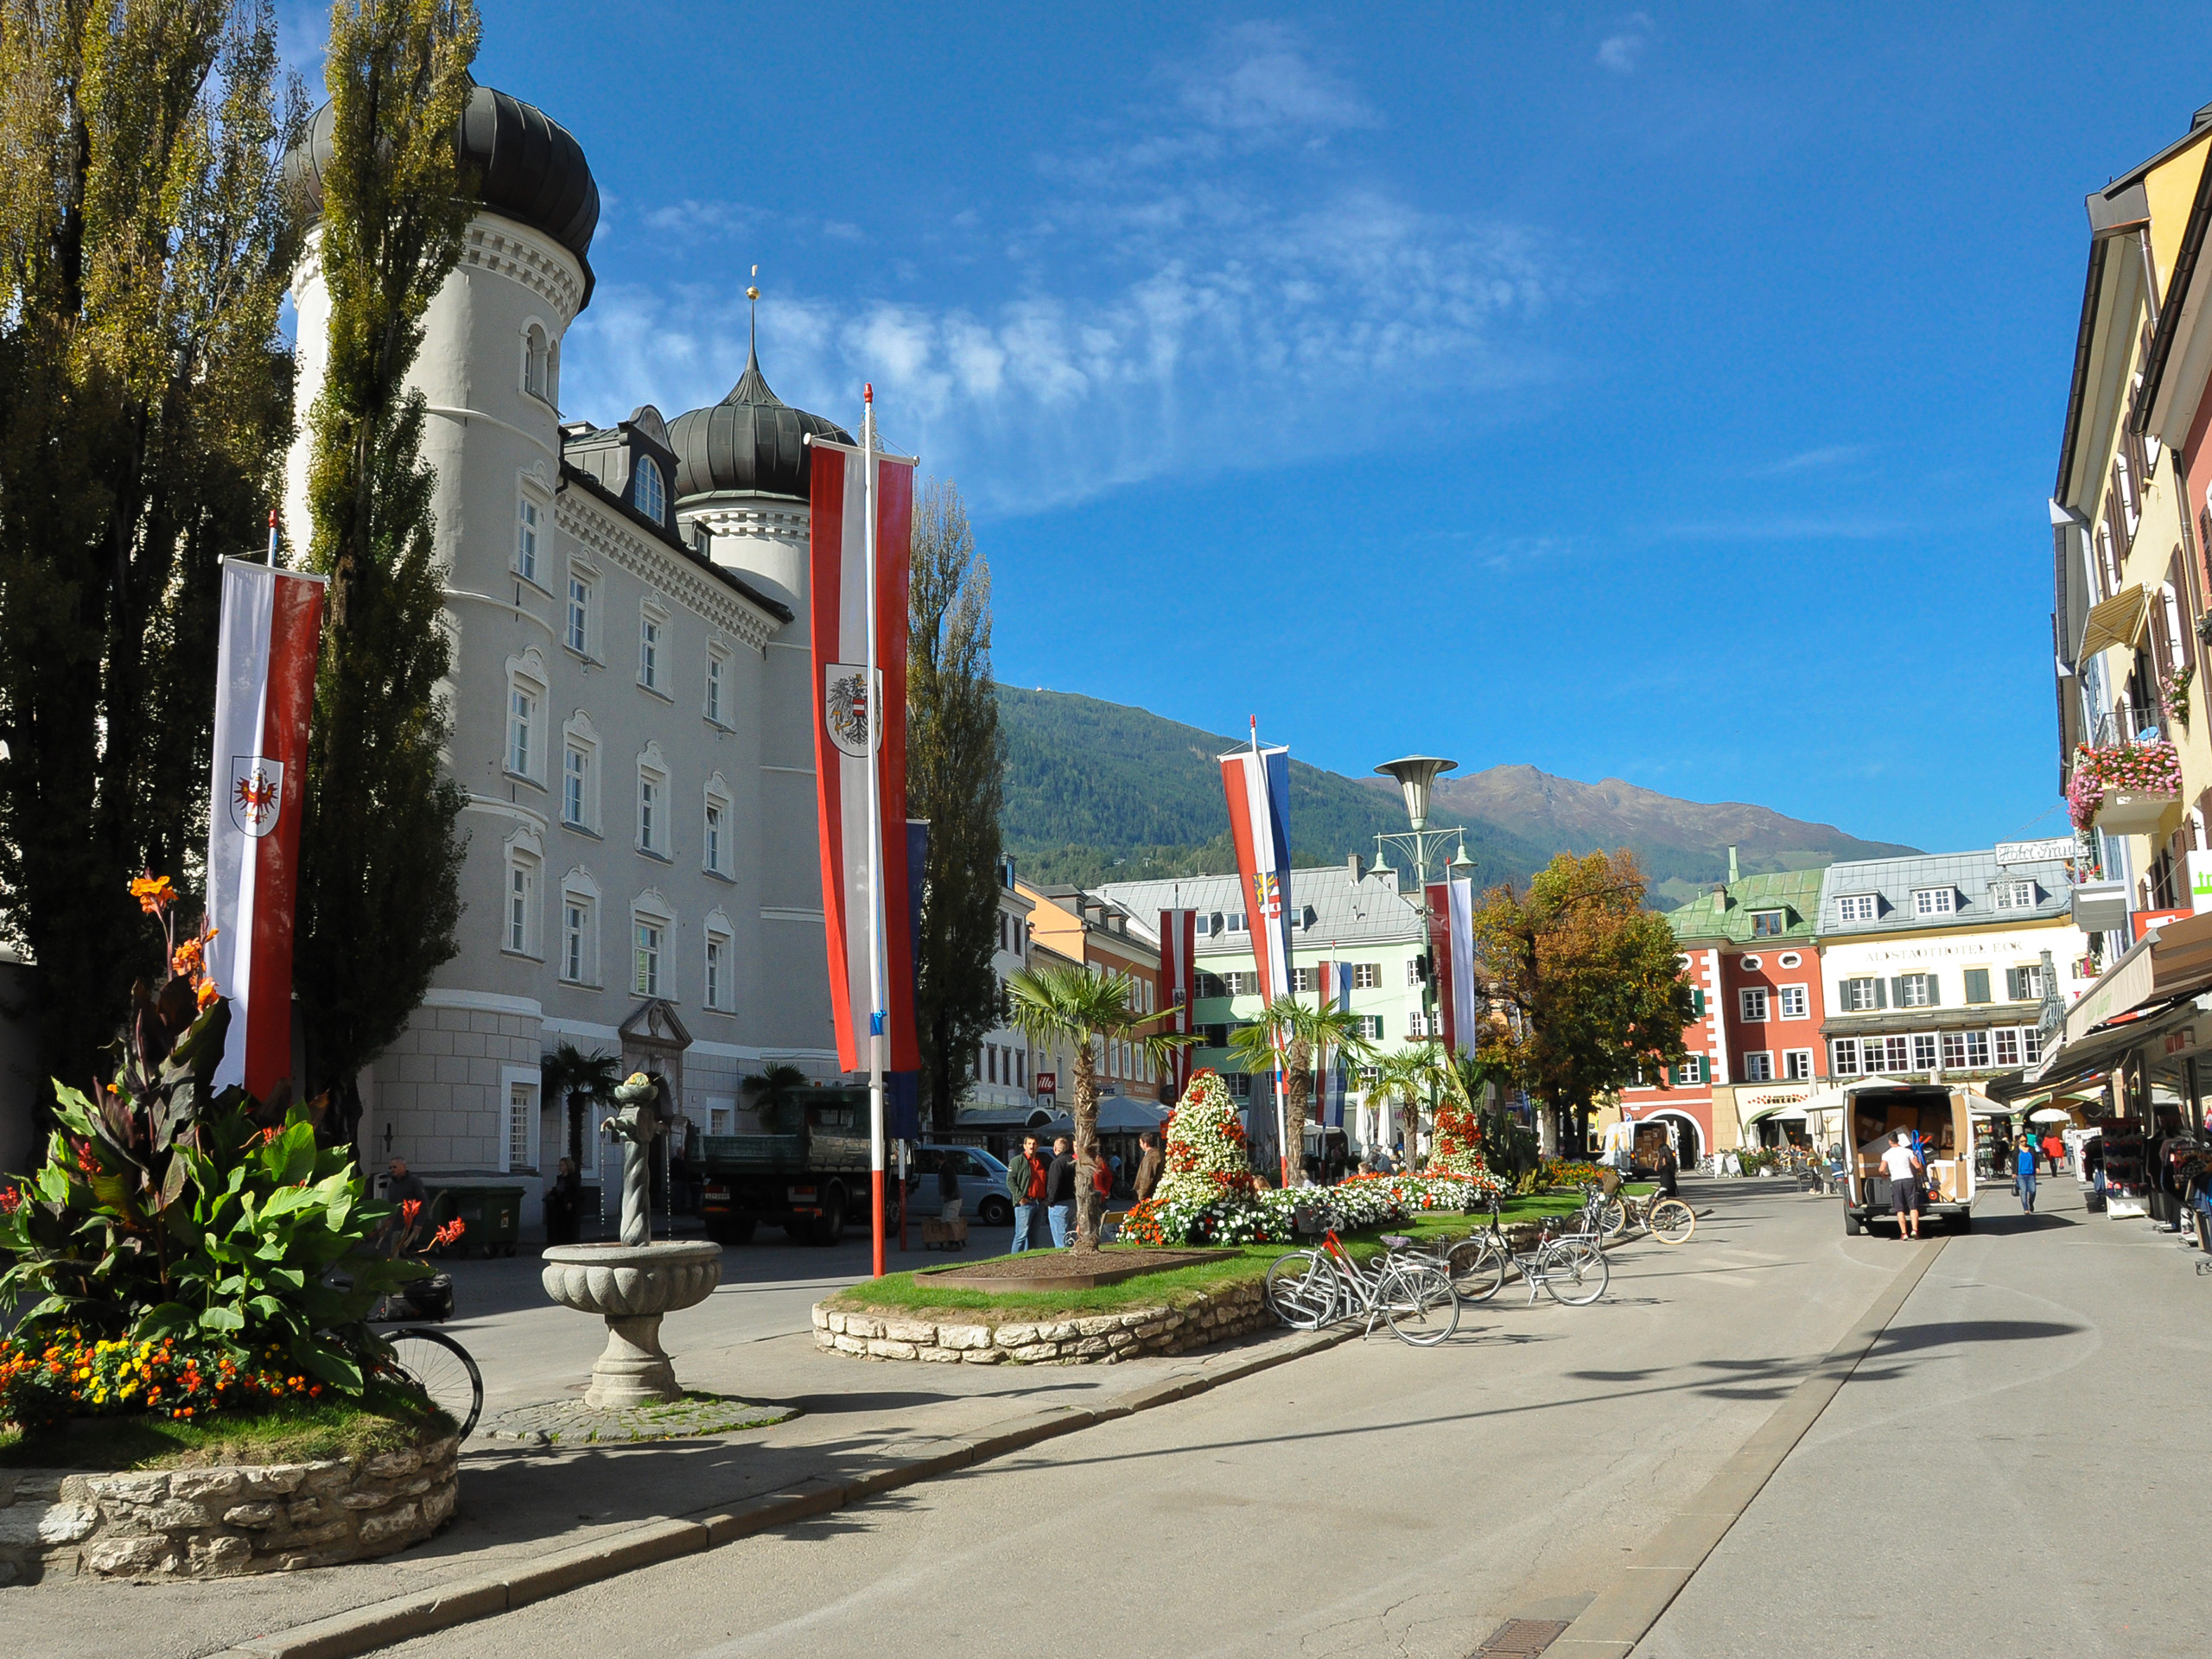 Streets of Lienz